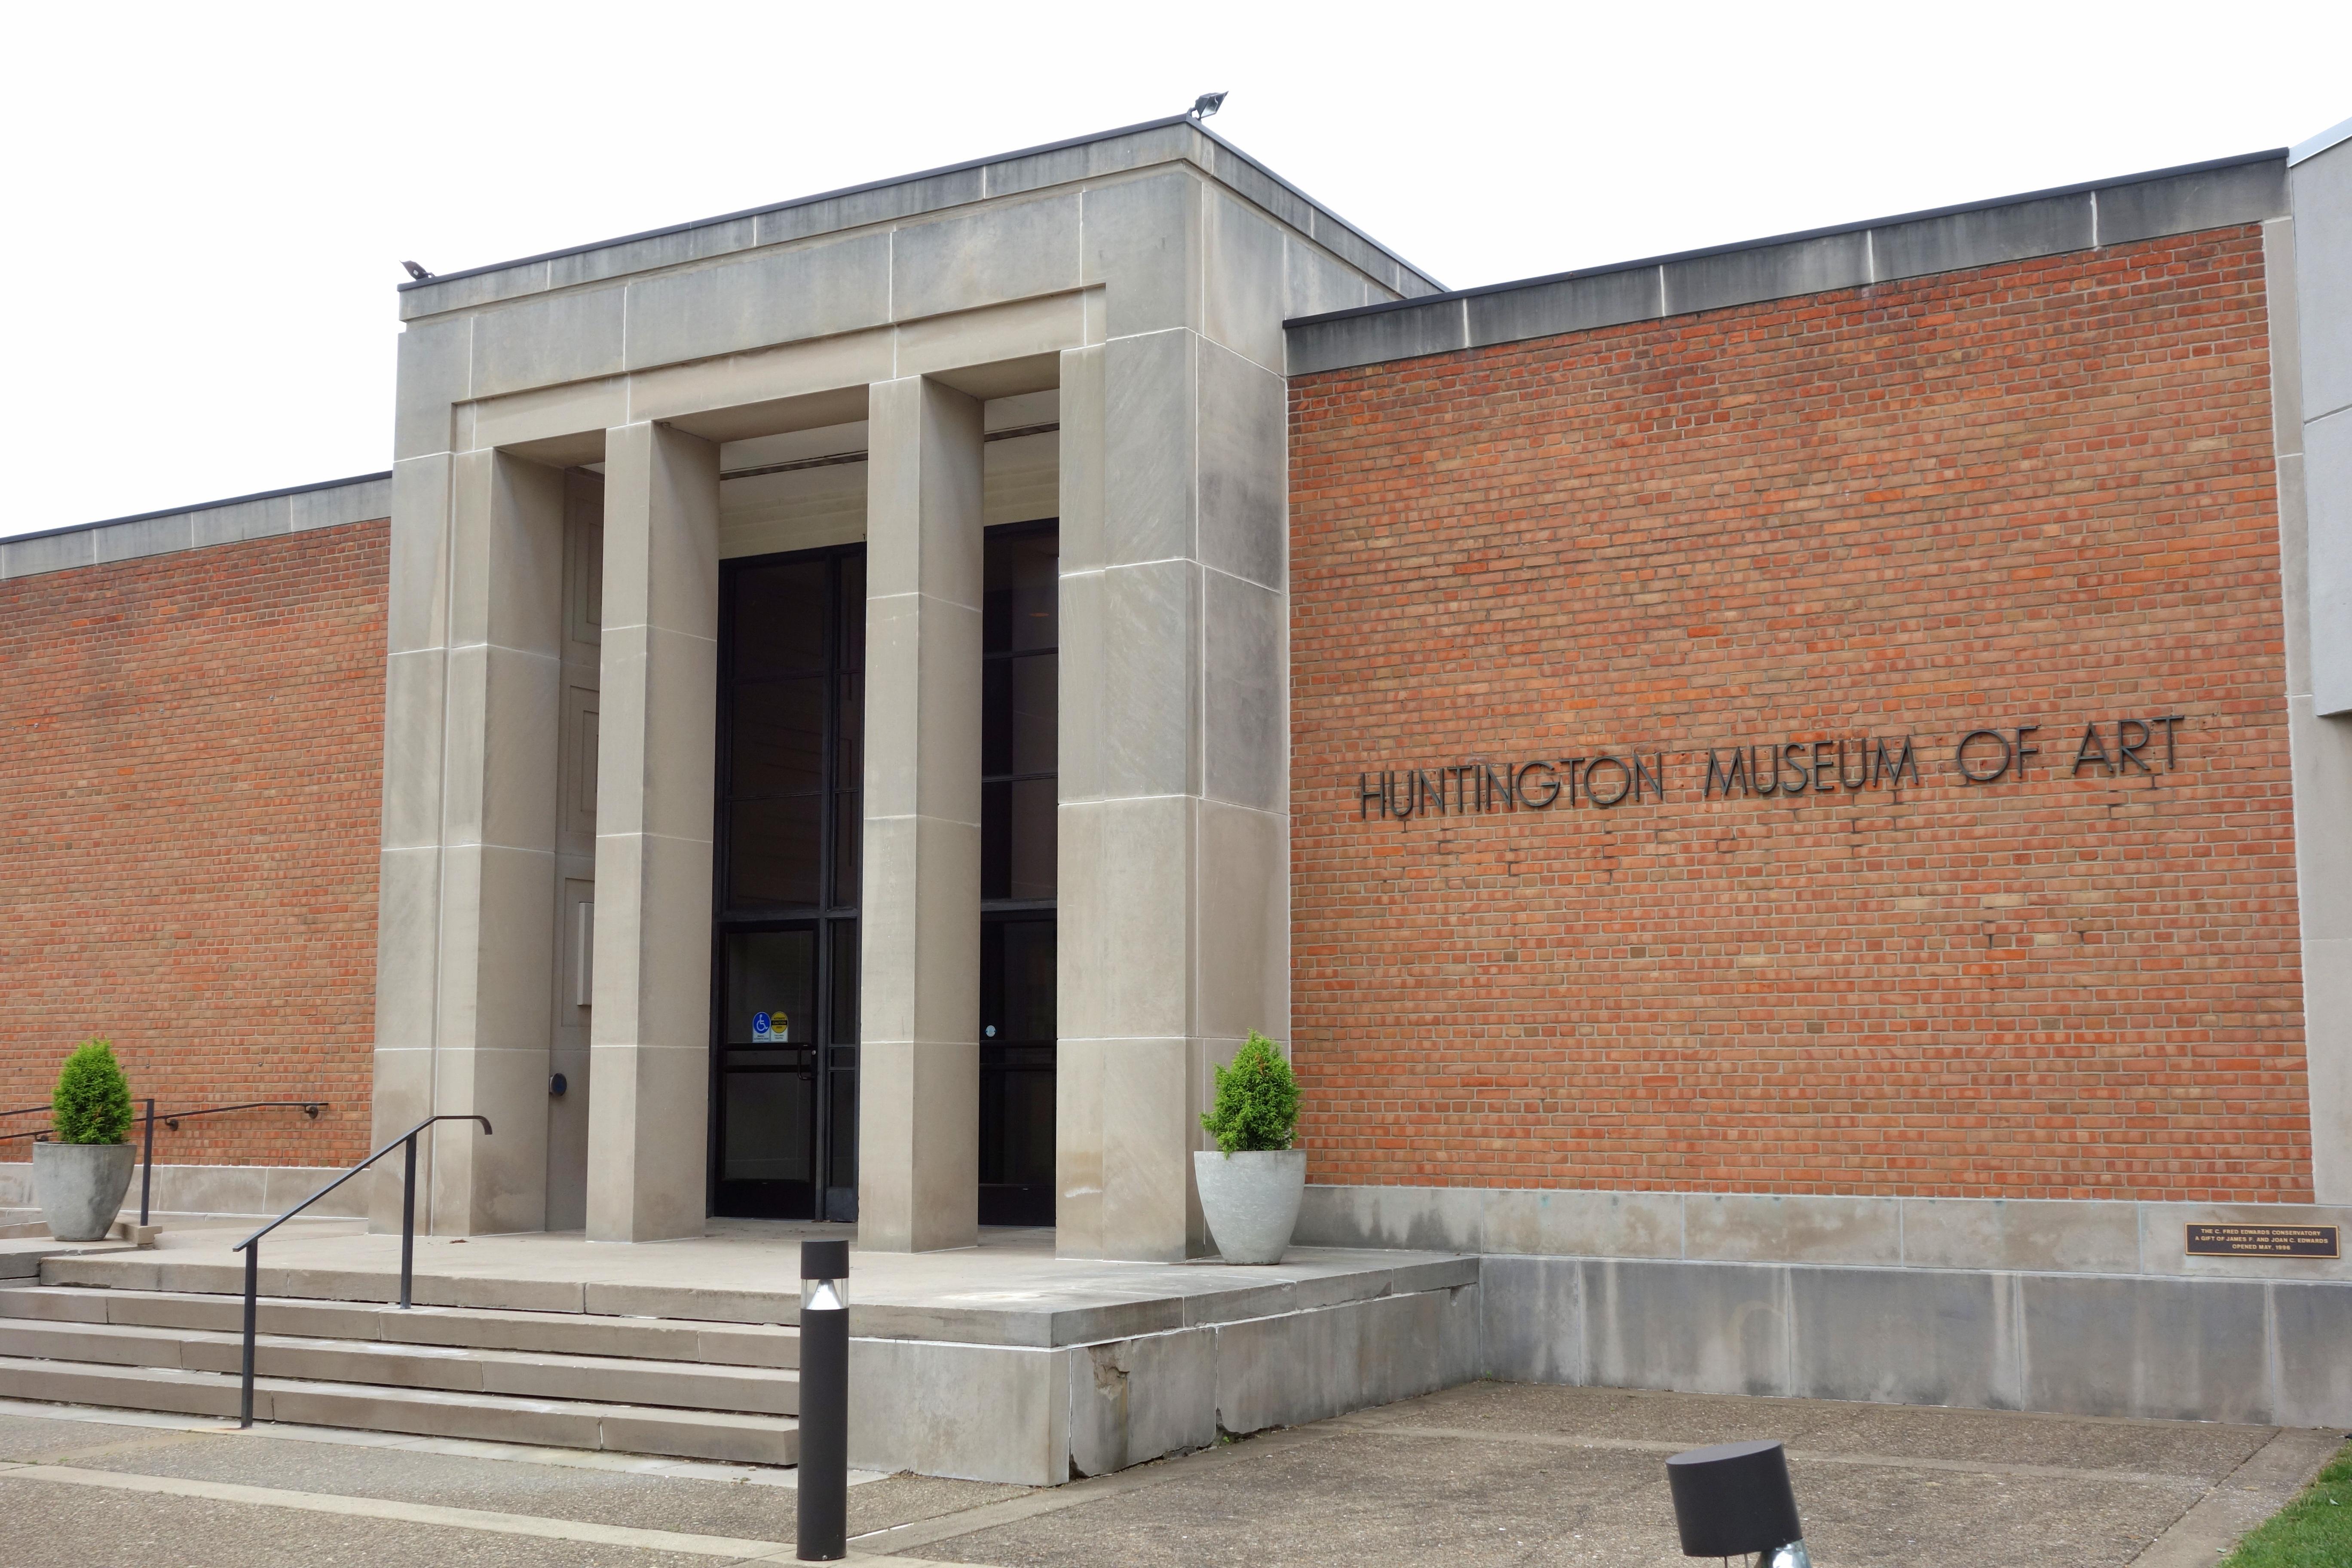 File:Huntington Museum of Art - Huntington, WV - DSC04809.JPG ...